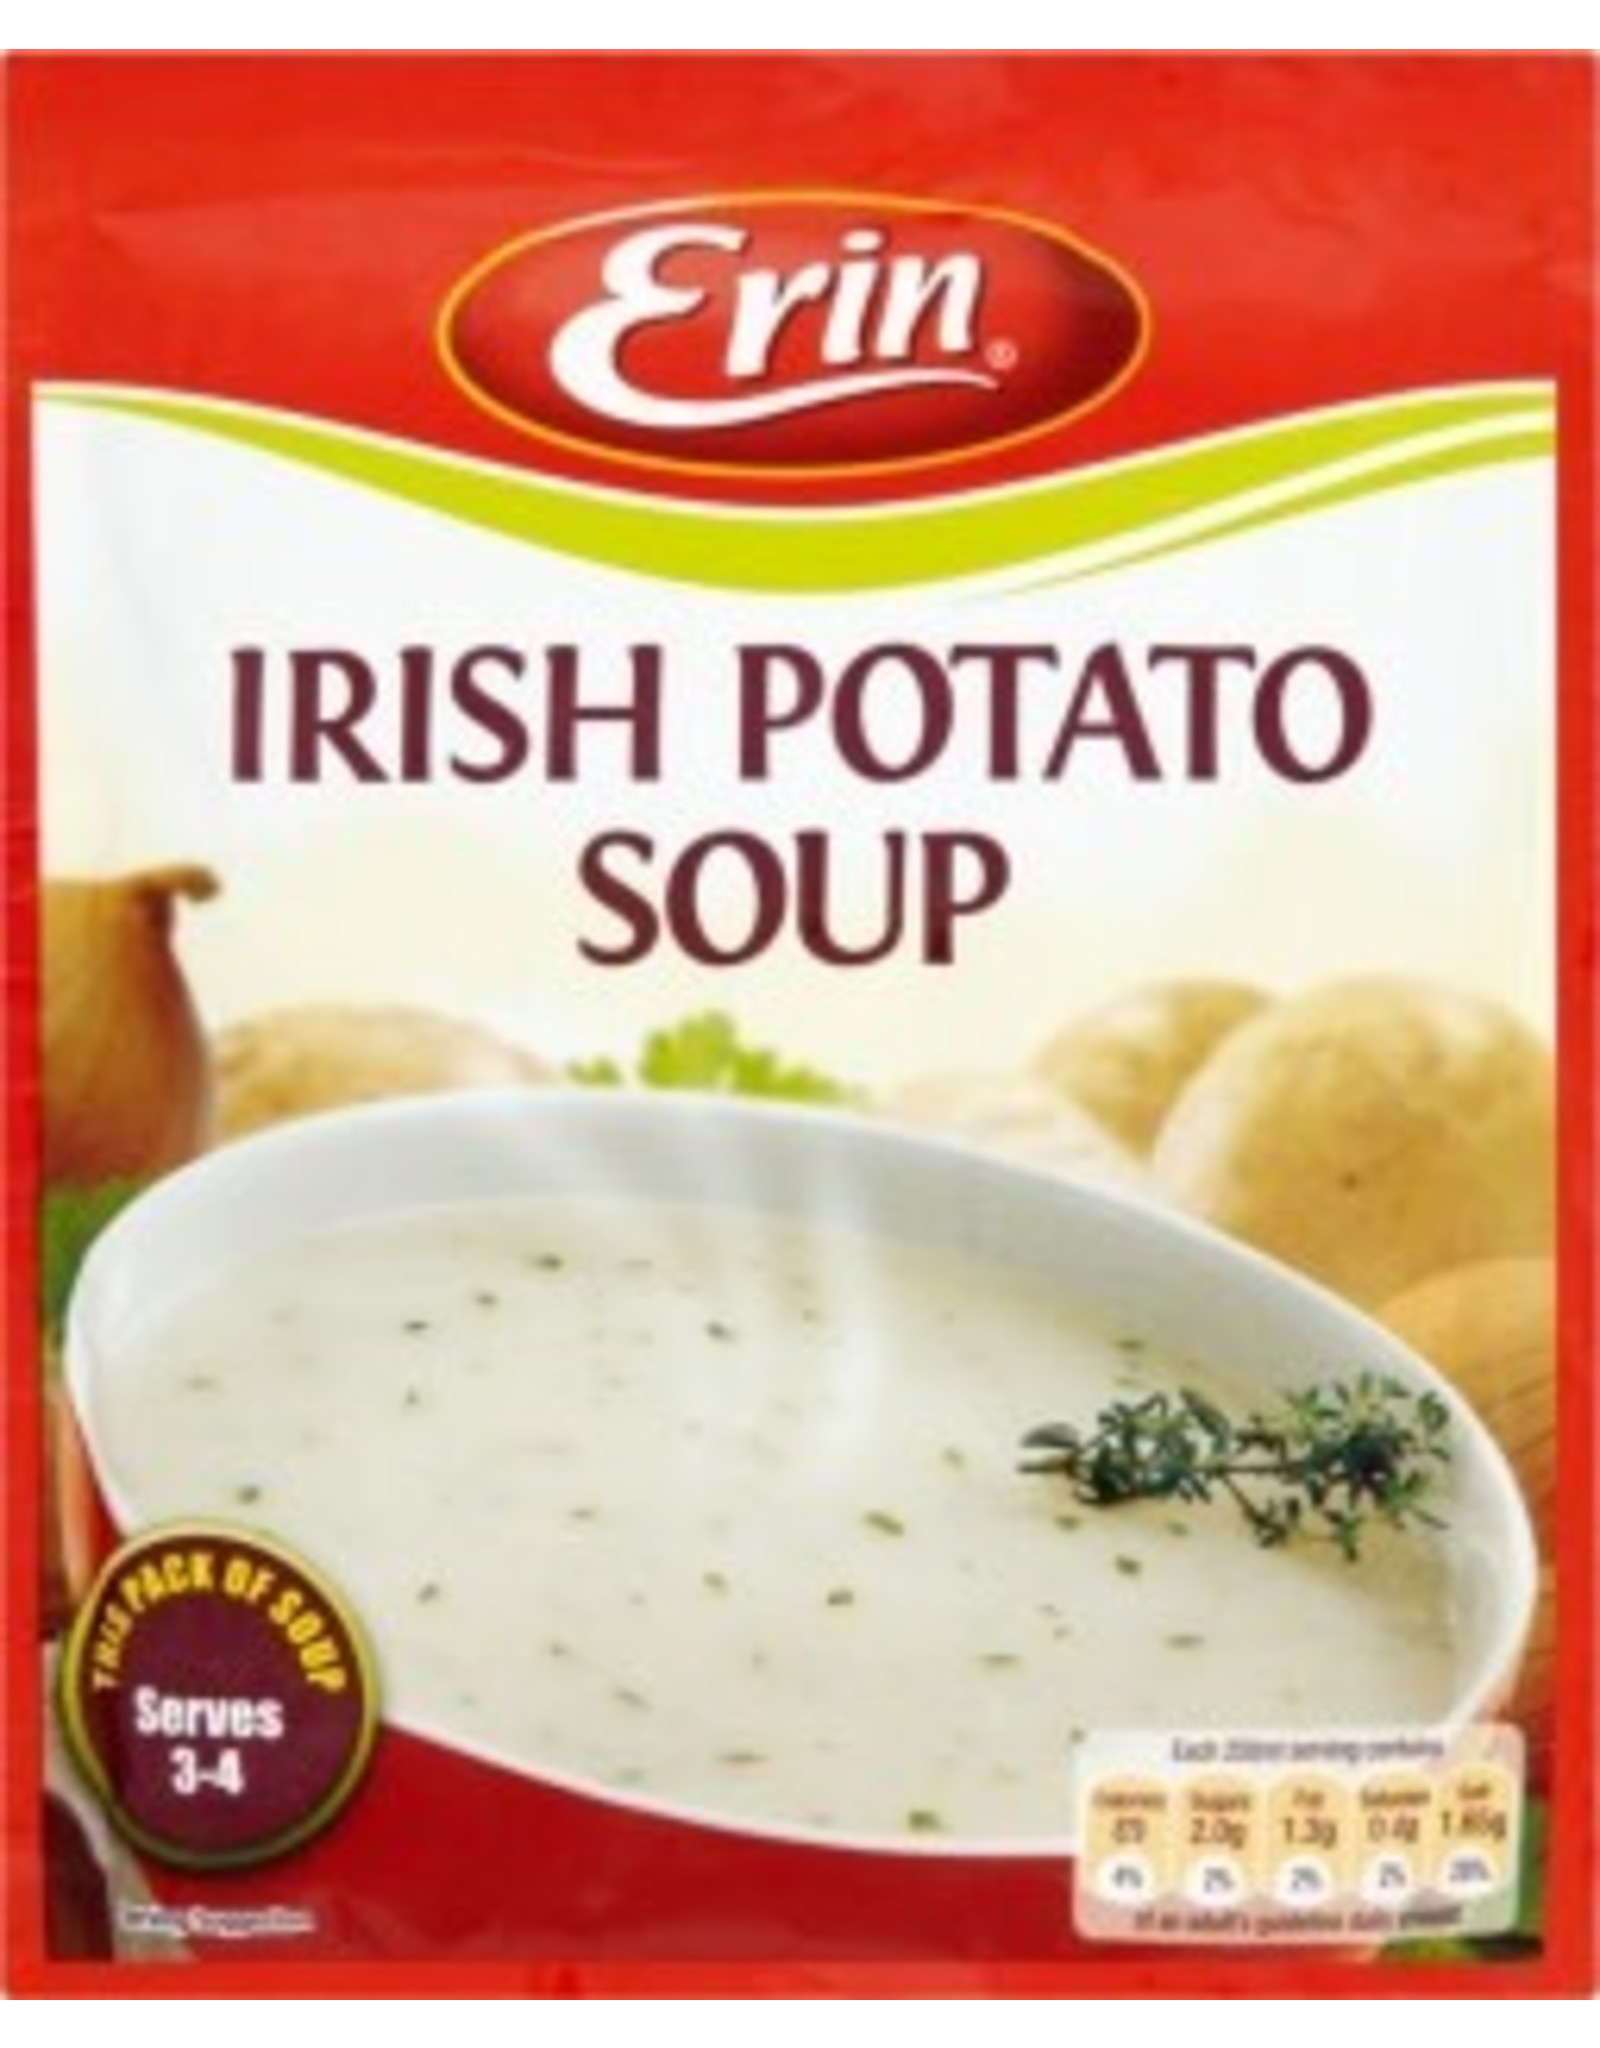 Erin Irish Potato Soup 84g Packet